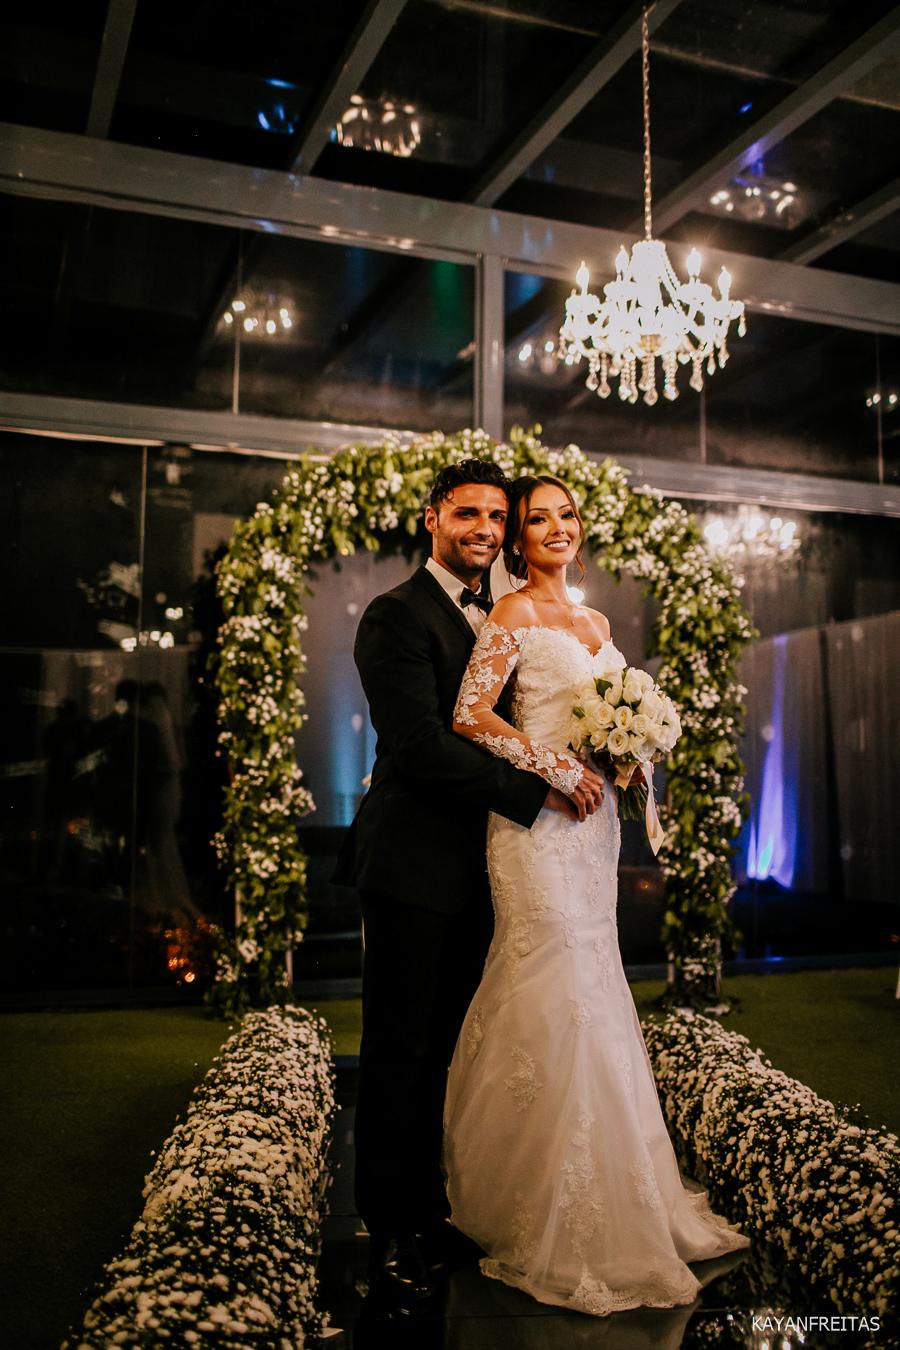 casamento-indaia-floripa-0069 Casamento Indaiá Florianópolis - Deise e Dário